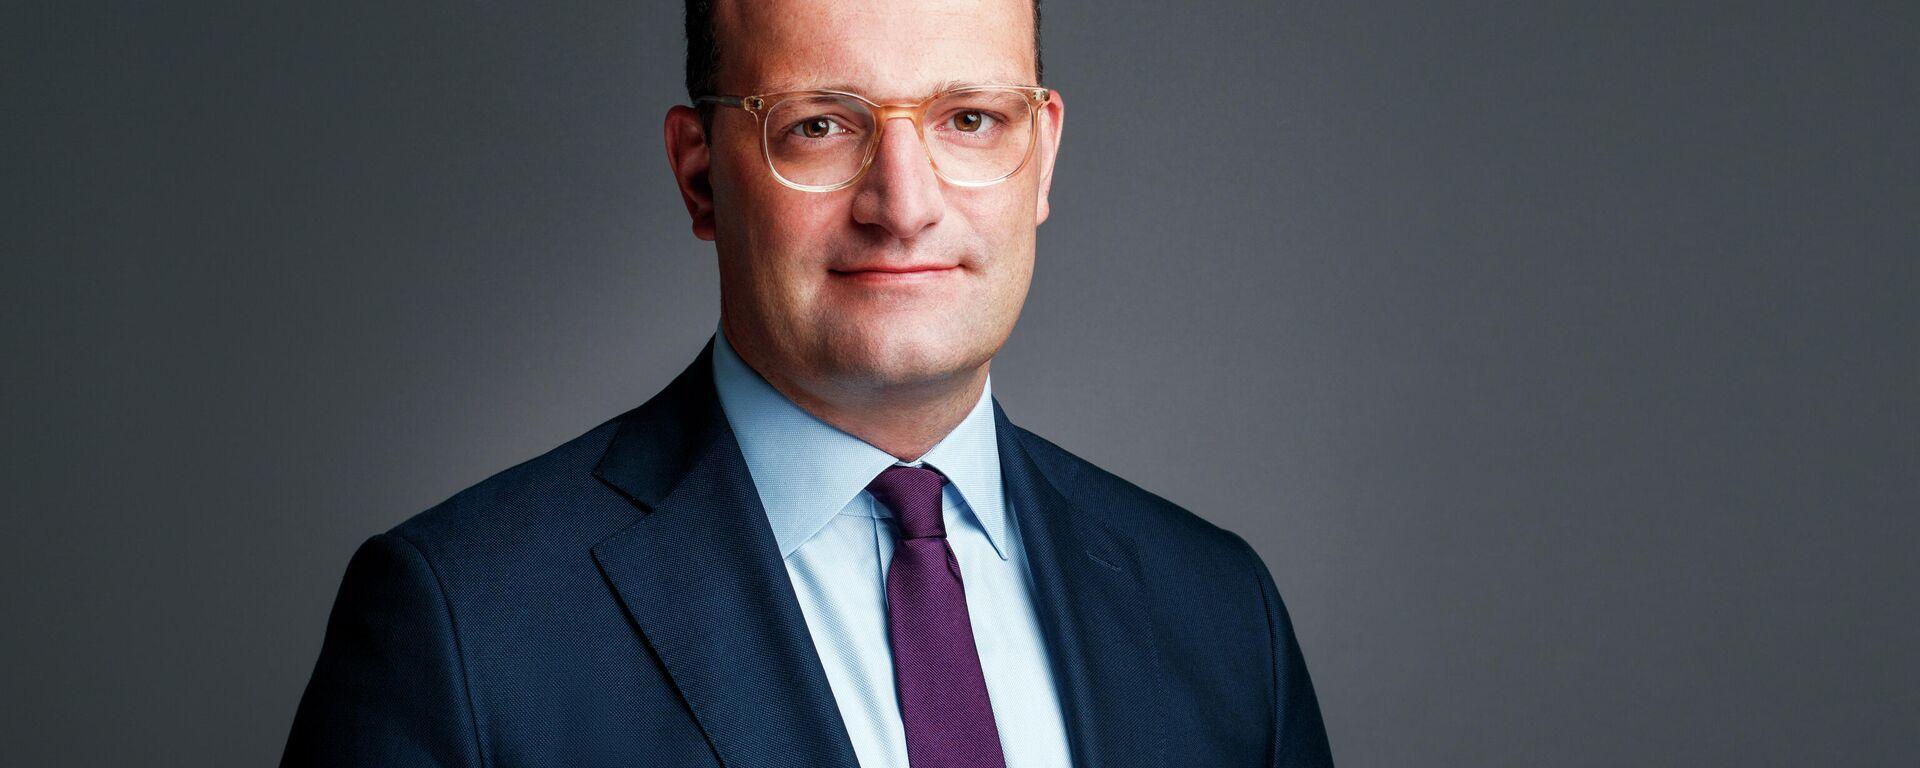 Bundesgesundheitsminister Jens Spahn - SNA, 1920, 17.09.2021